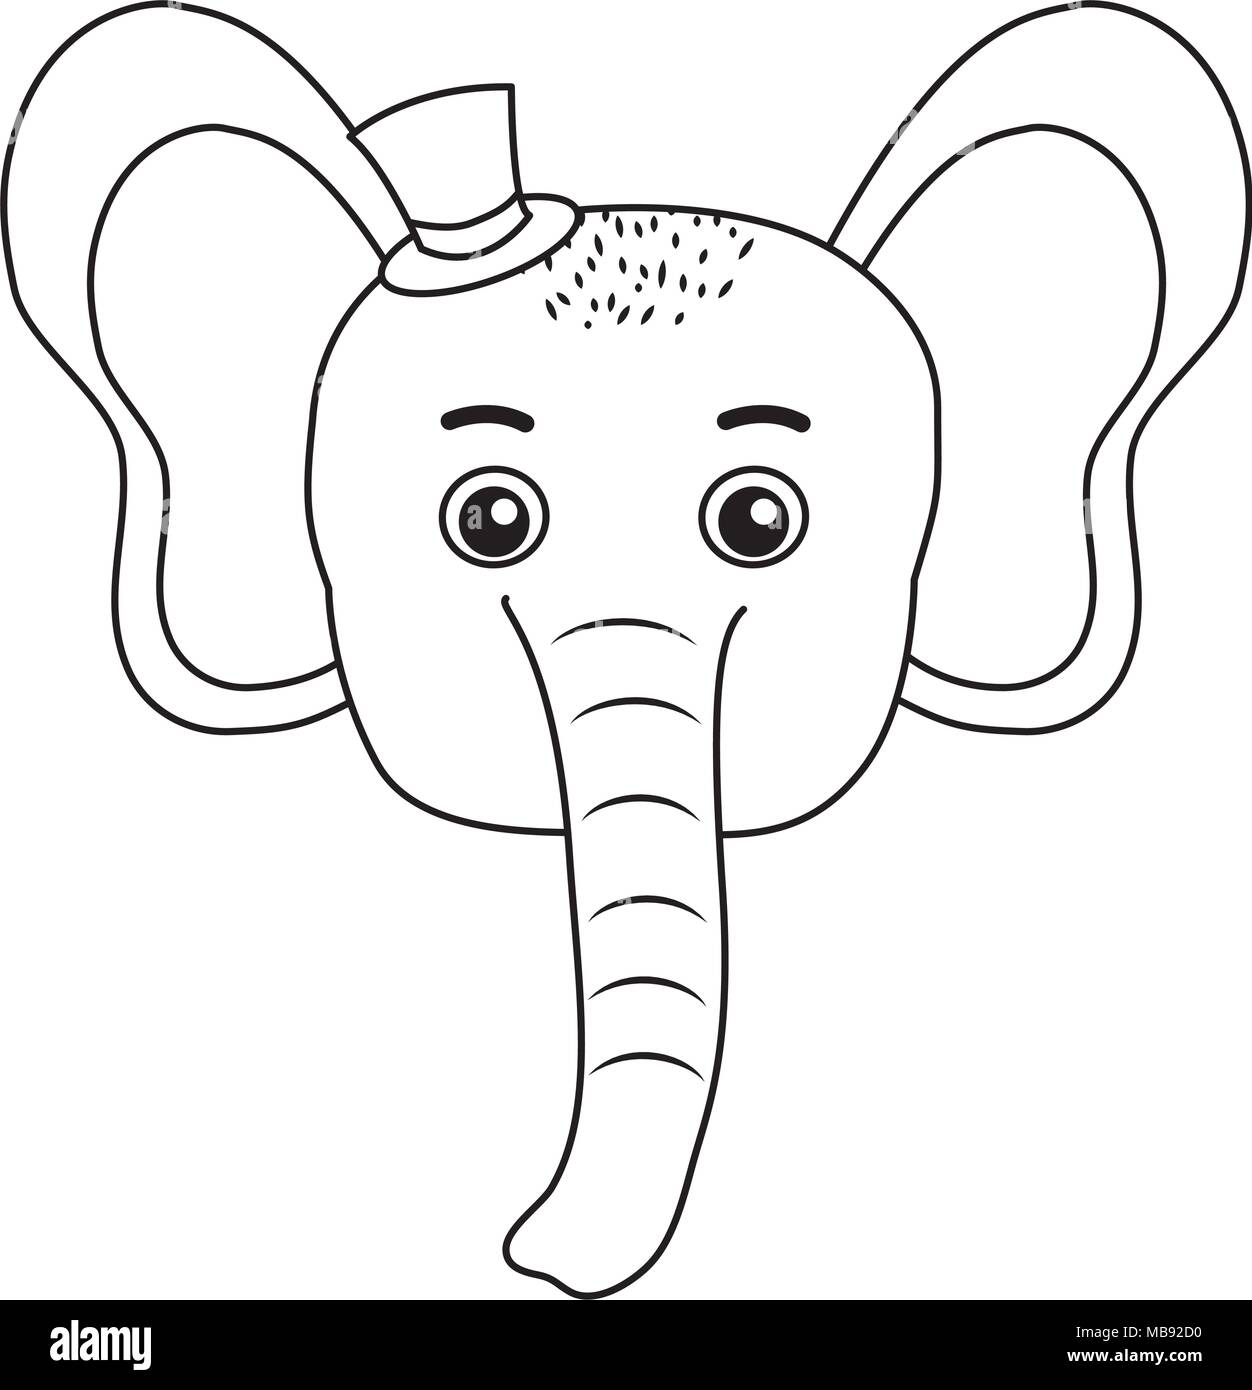 Elephant Head Cartoon Photos   Elephant Head Cartoon Images - Page 2 ... b759d39283a